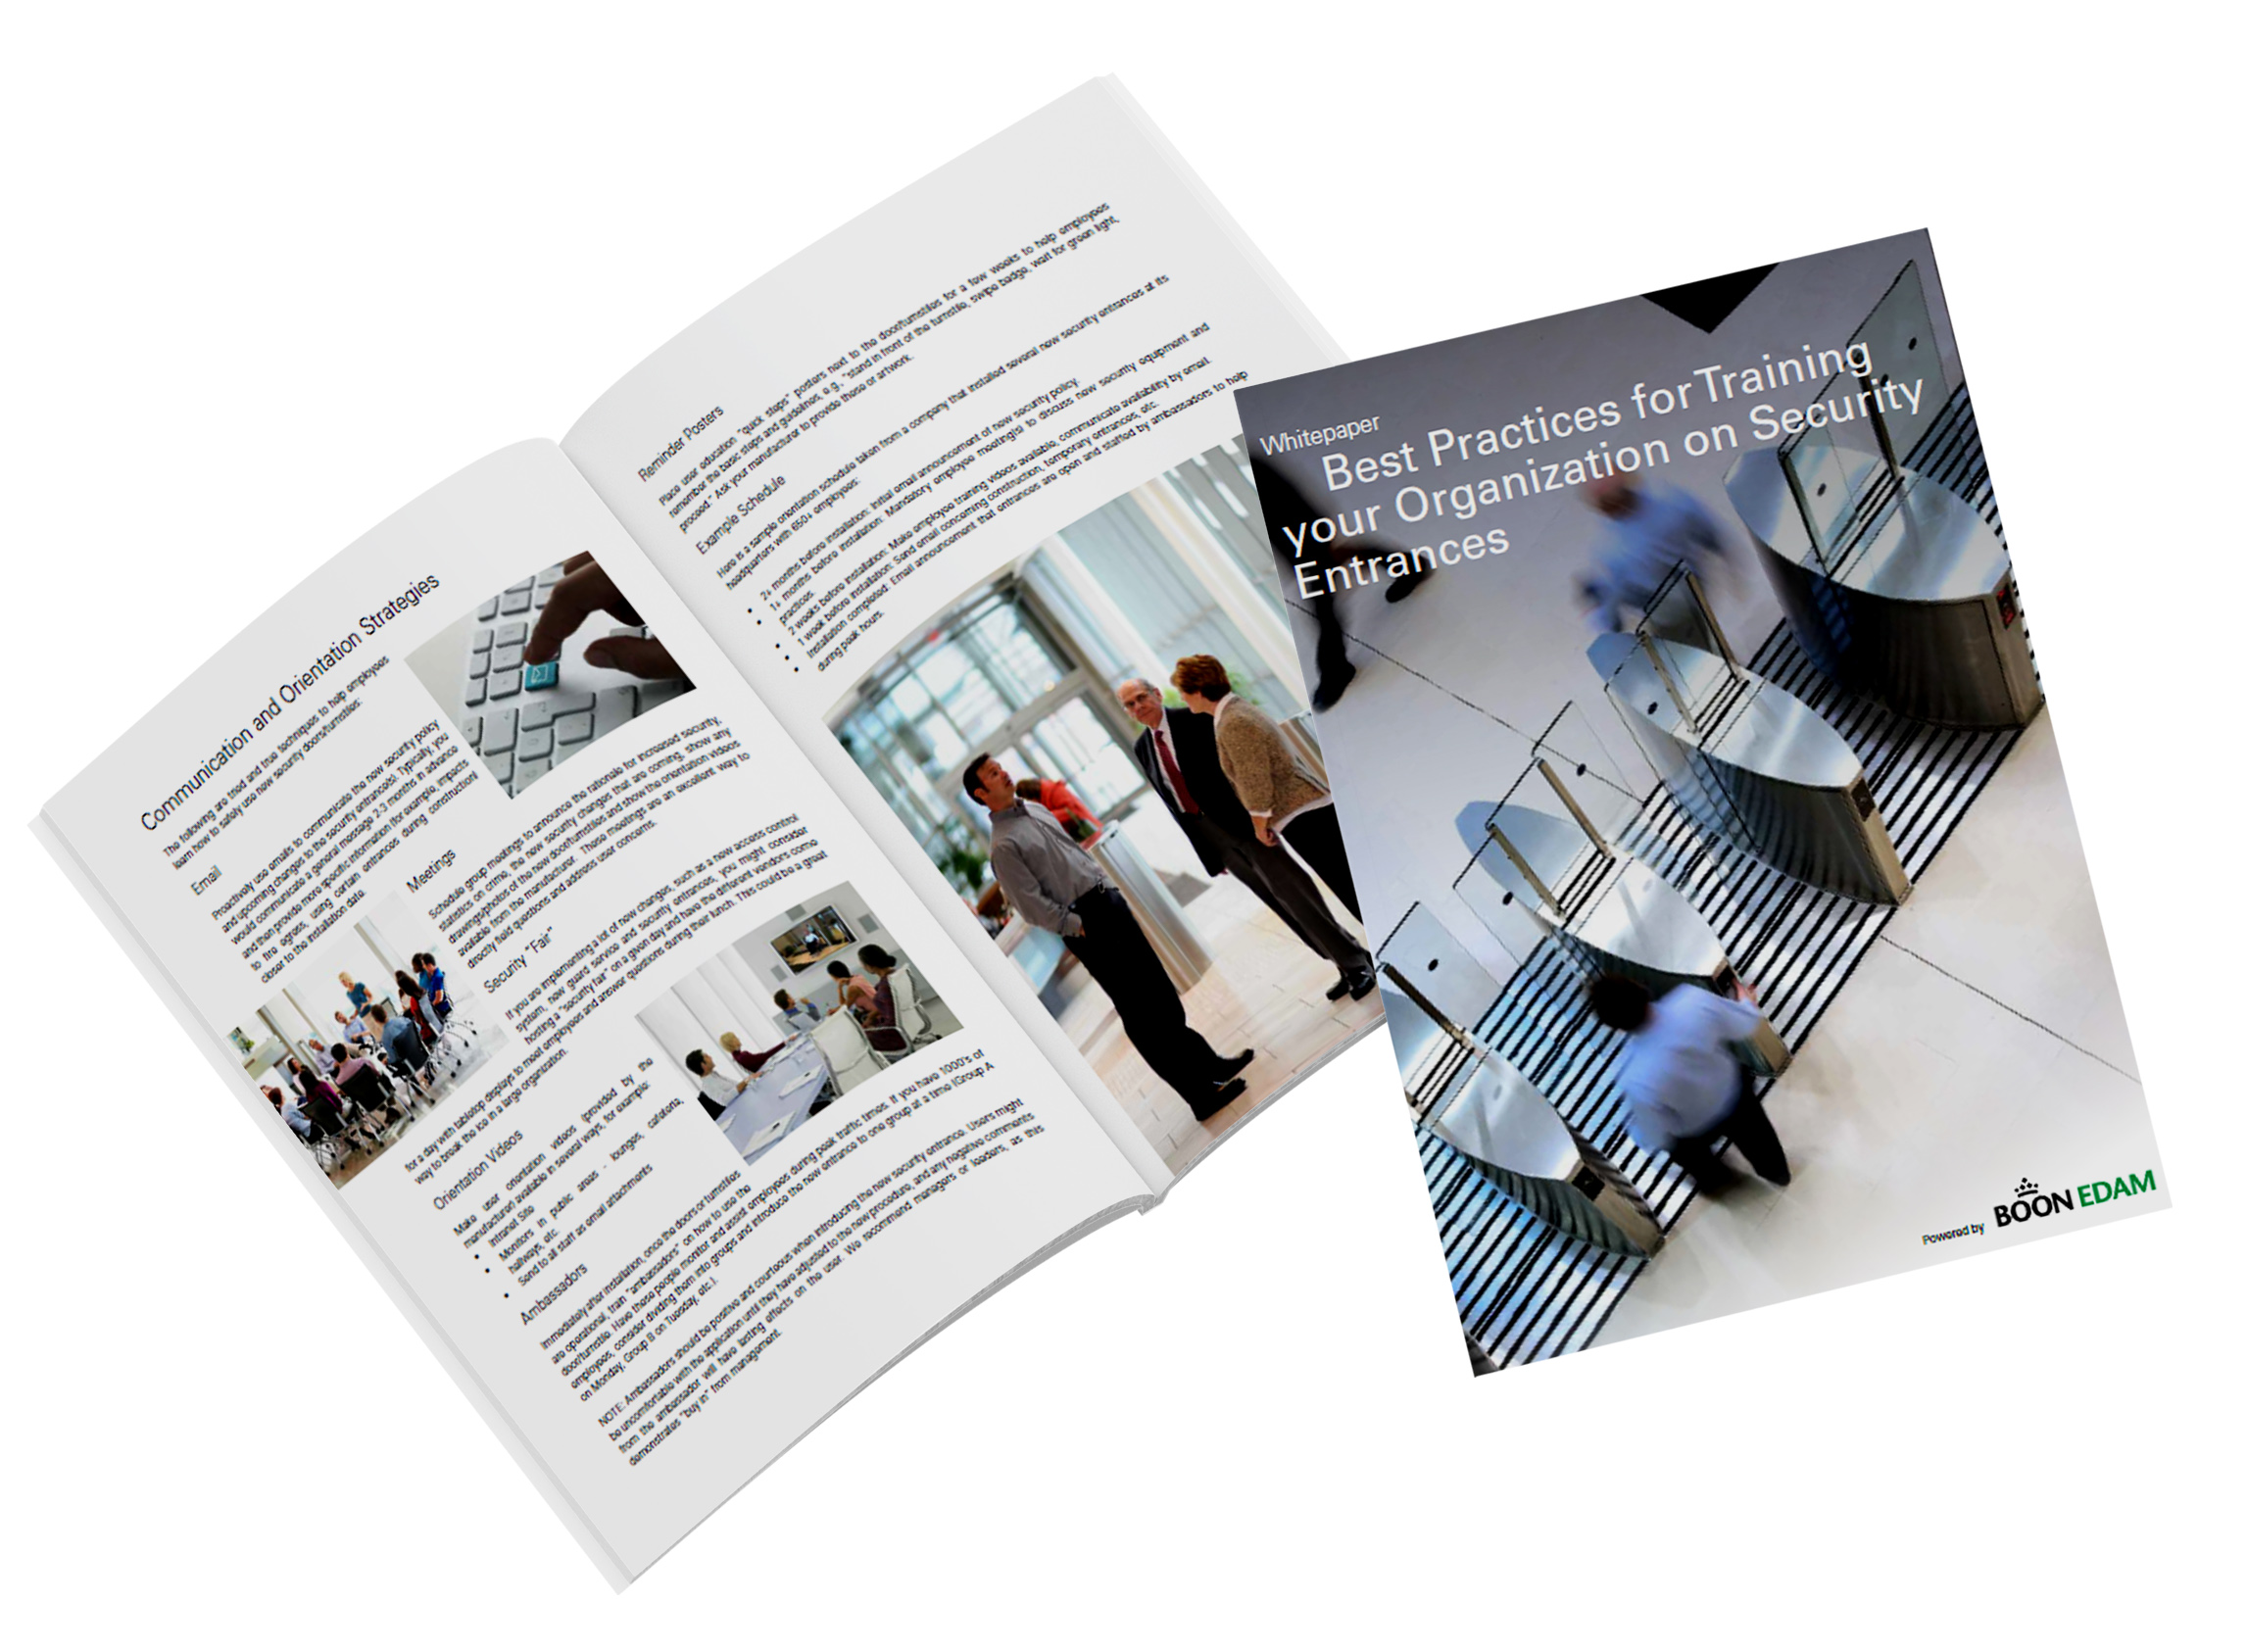 01_LP_Whitepaper_Best Practices for Training your Org on Sec Entrances_Paper Image-1.jpg